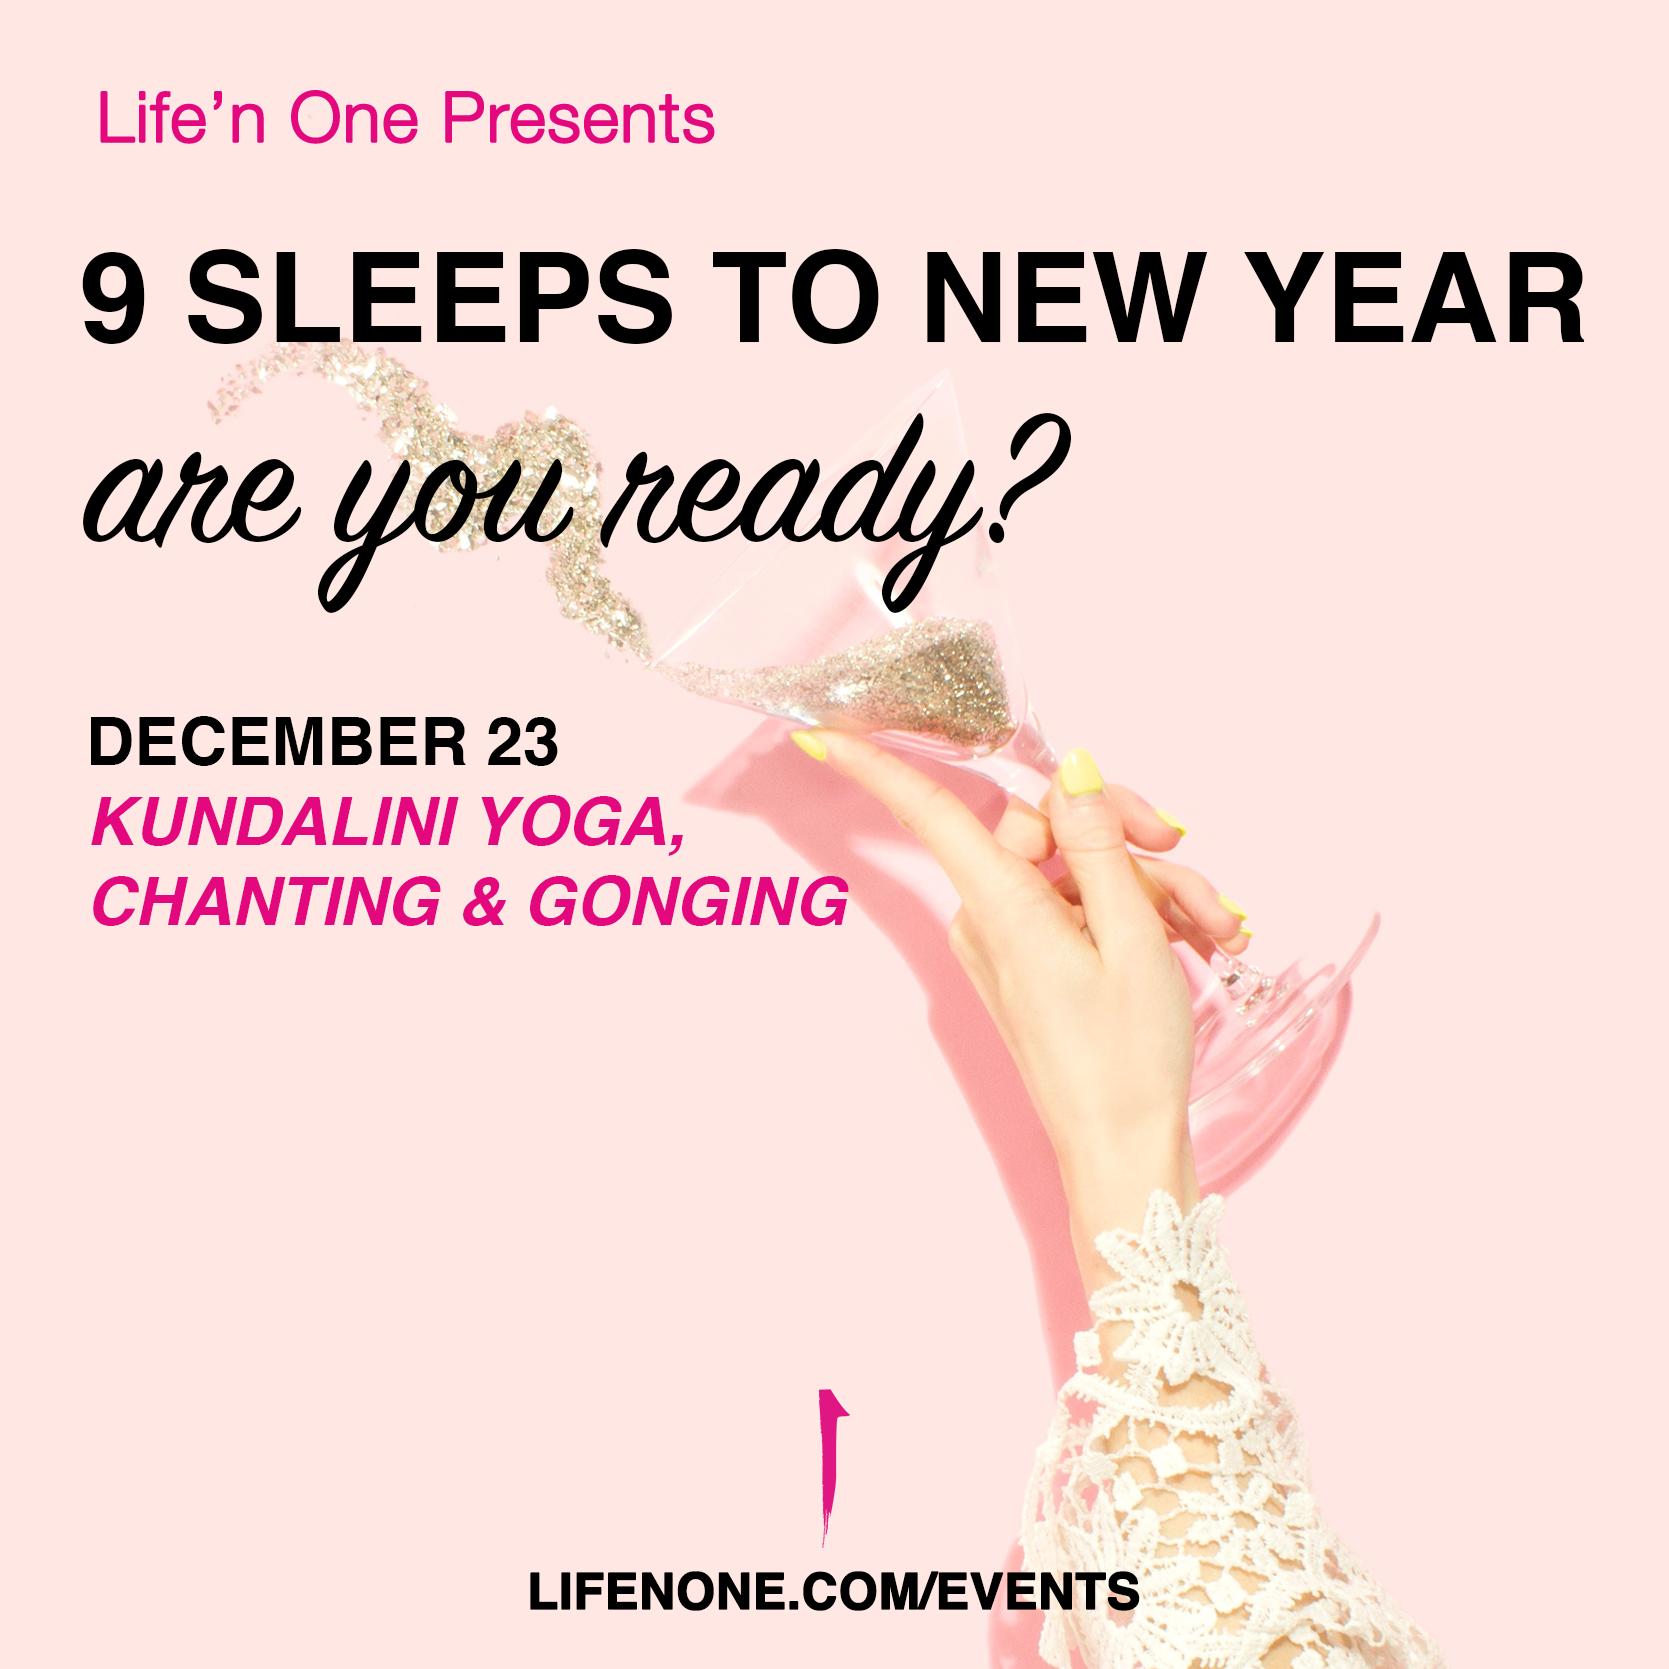 9 Sleeps to New Year - Are you Ready? // Kundalini Yoga, Chanting & Gonging